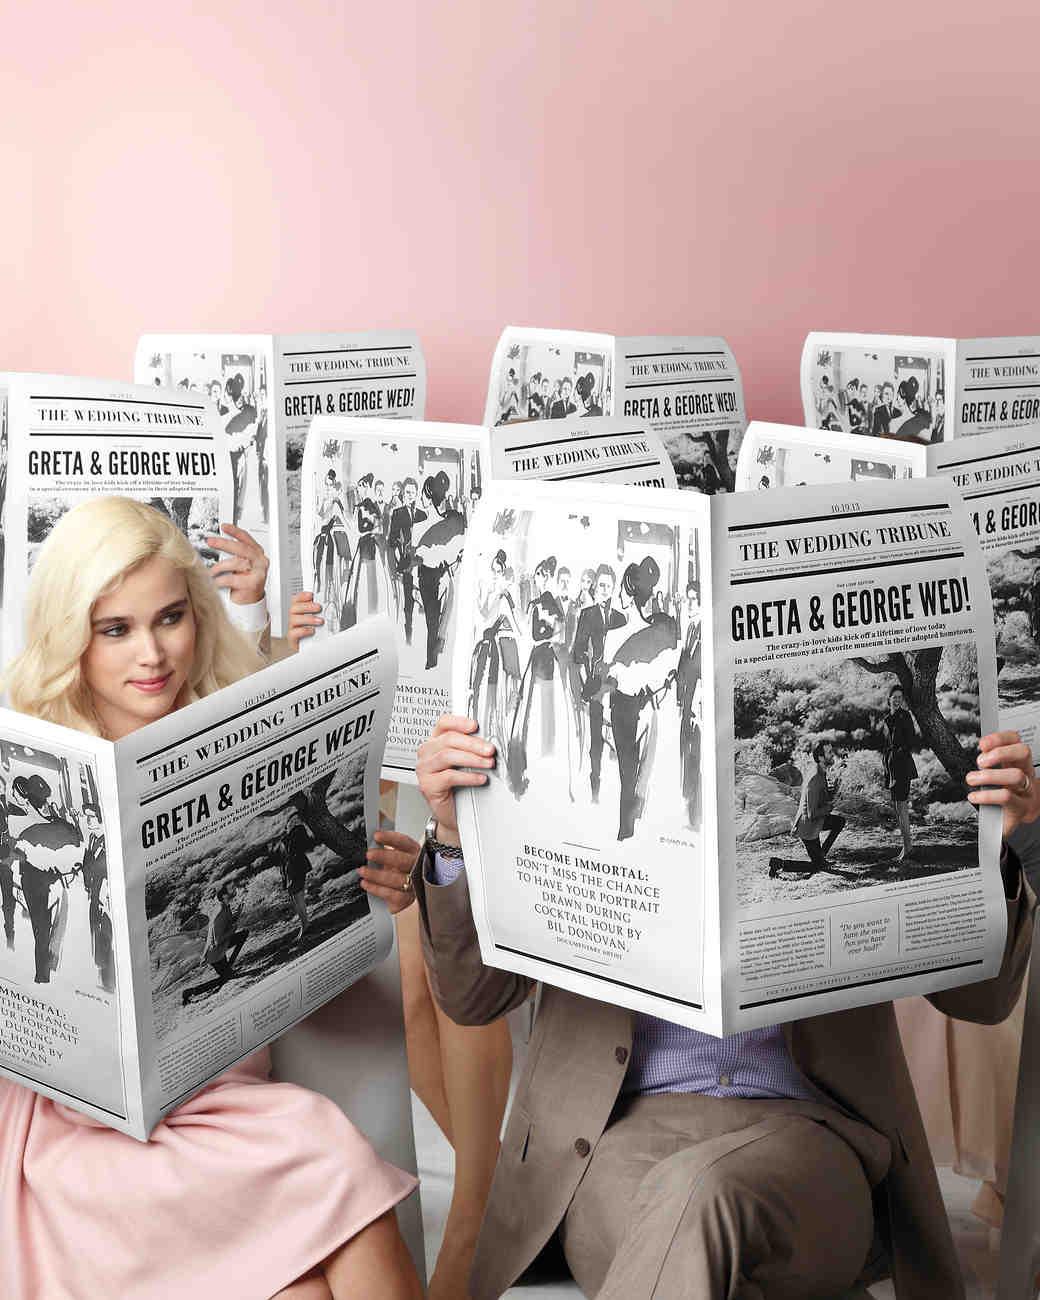 newspapers-398-mwd110197.jpg